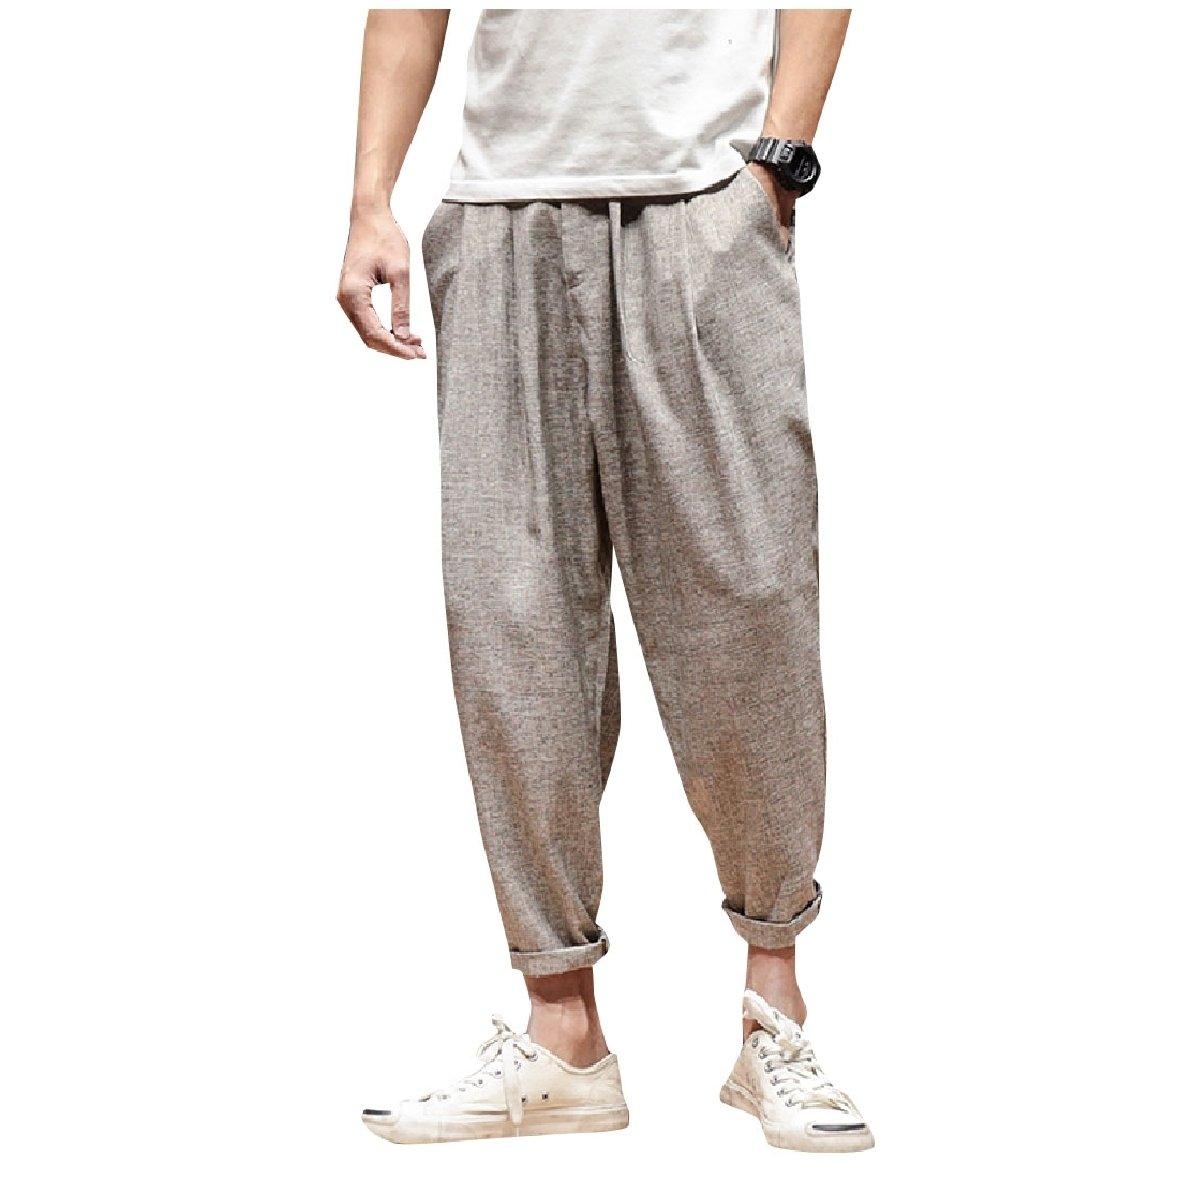 YUNY Mens Plus Size Elastic Waist Trousers Breathable Harem Pants Apricot 3XL